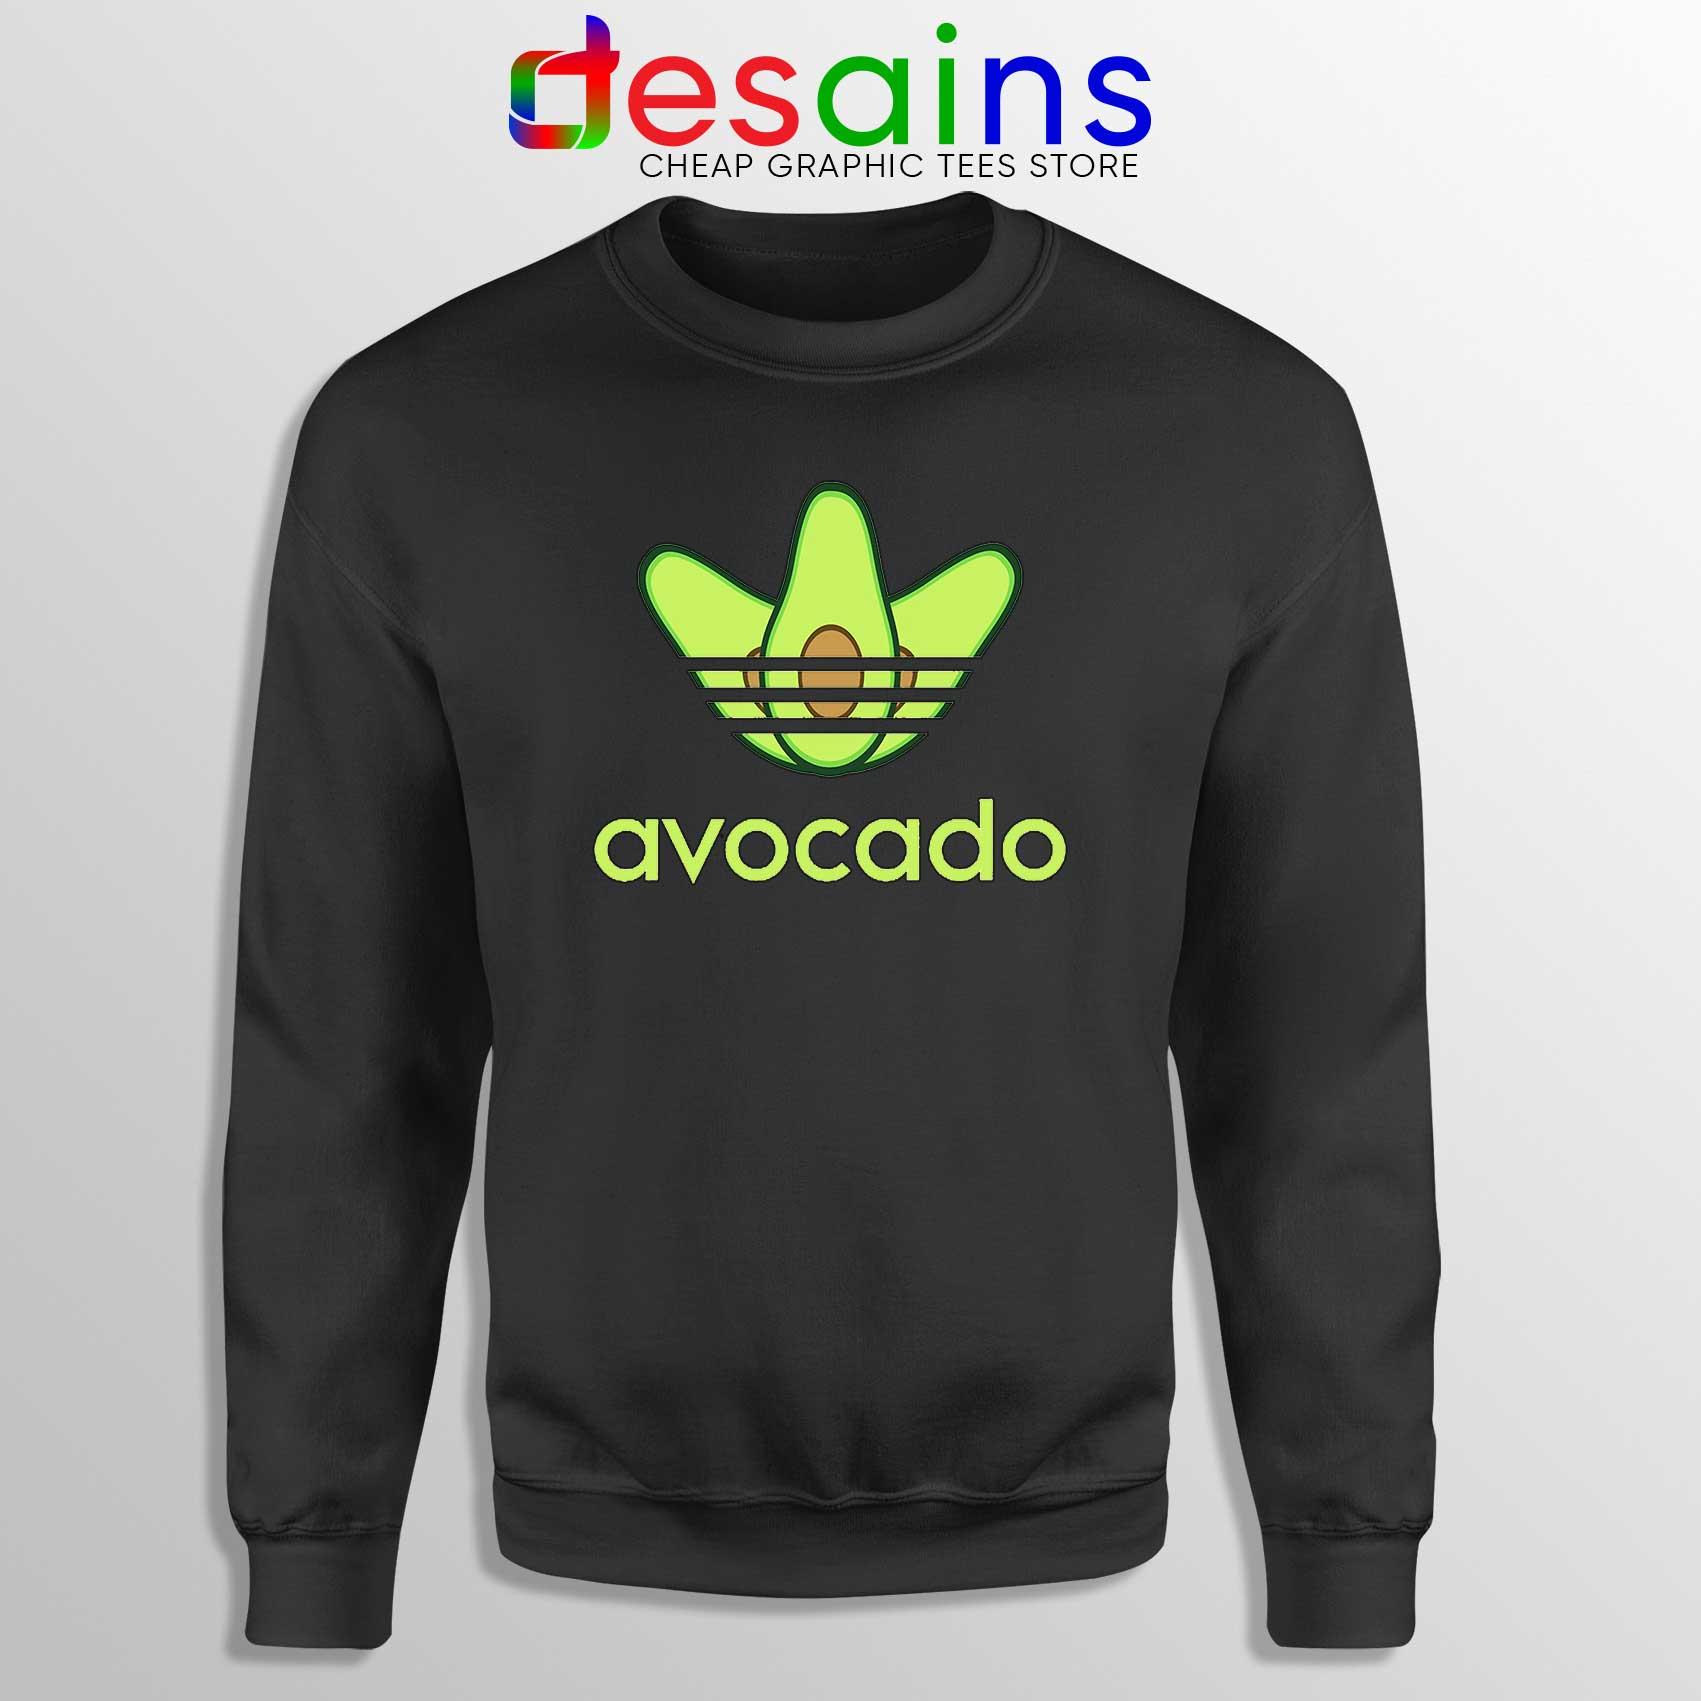 25b79da1d Sweatshirt-Avocado-Originals-Three-Stripes-Crewneck-Size-S-3XL.jpg